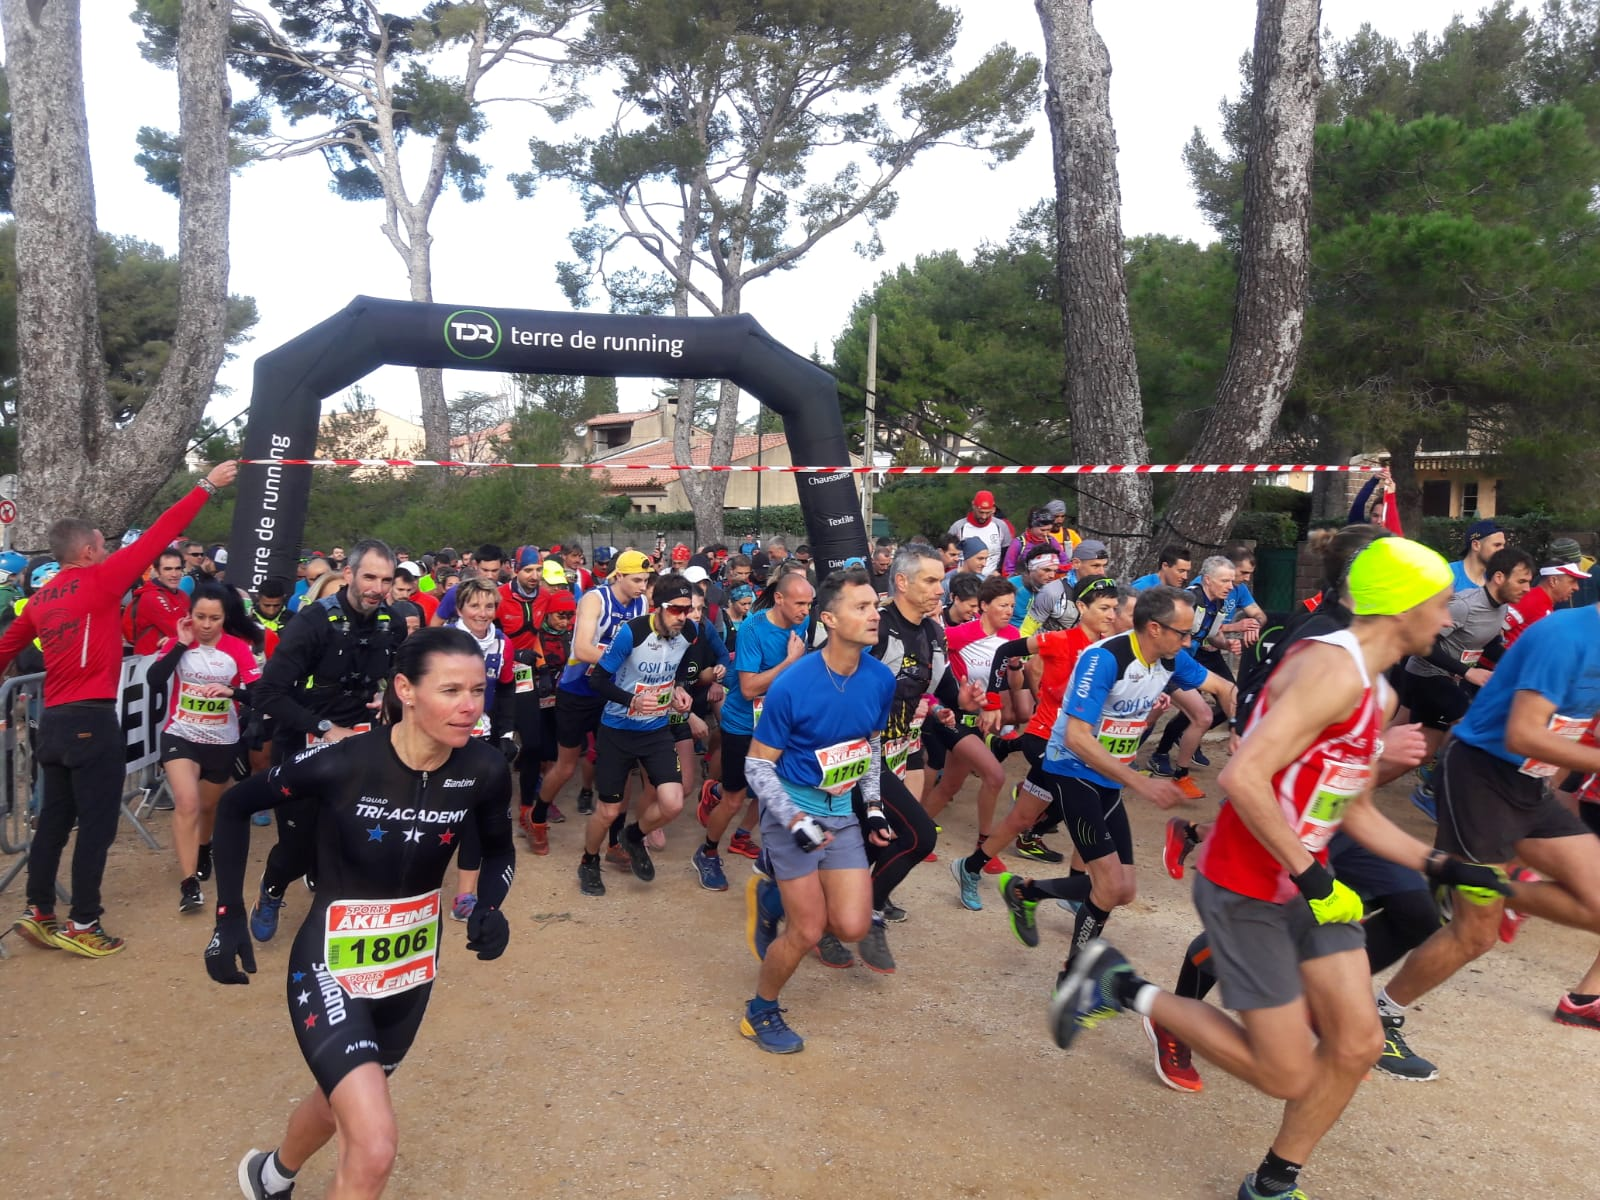 Tri-Academy-Stage-Triathlon-Var-83-Carqueiranne (8)